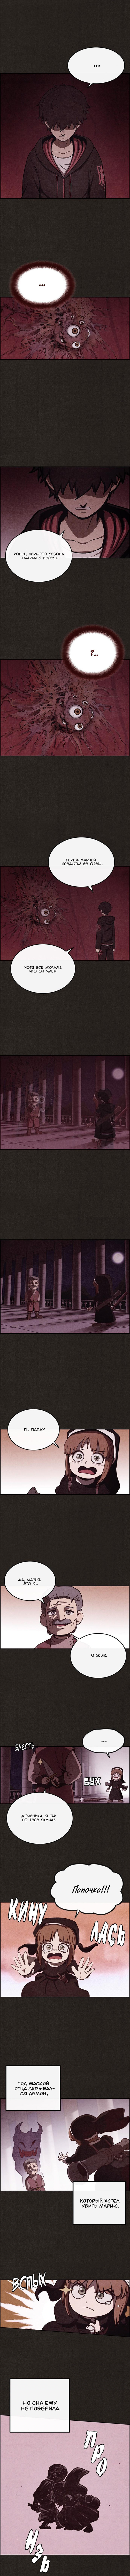 https://r1.ninemanga.com/comics/pic2/26/33050/435712/1537085660290.jpg Page 3